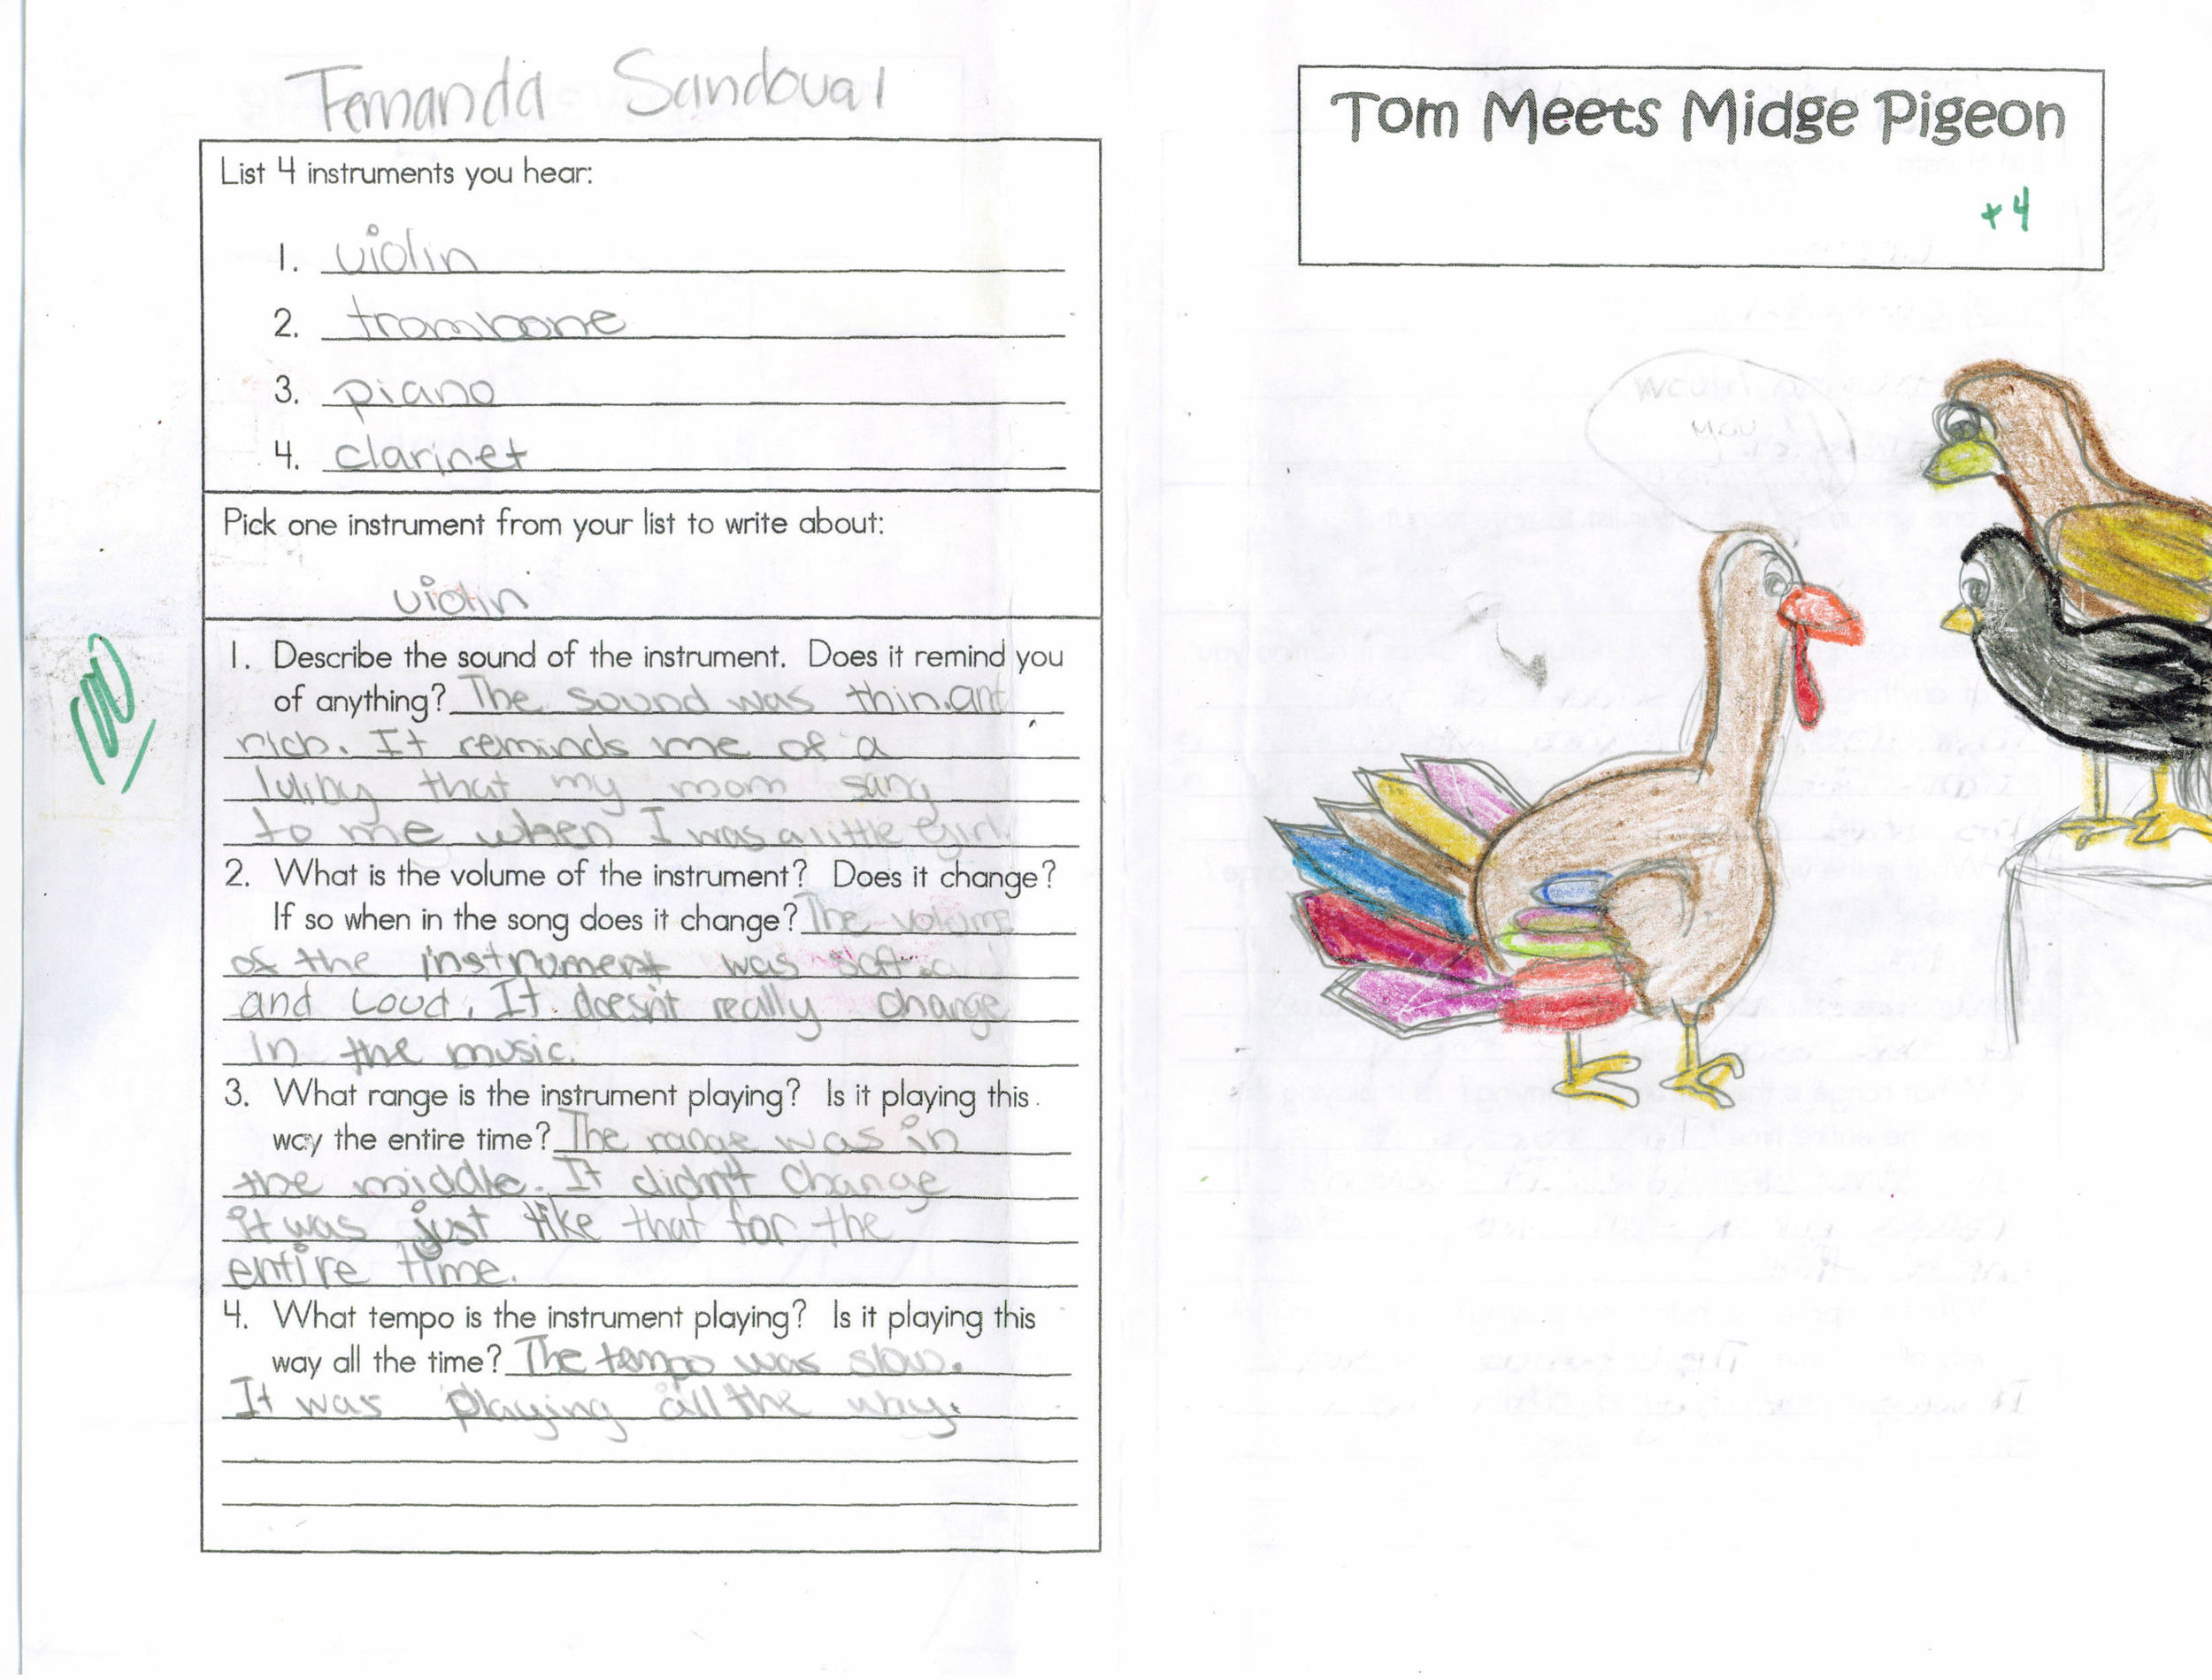 tough turkey in the big city: tom meets midge pigeon        Second Grade, San Josa Edison Academy, California